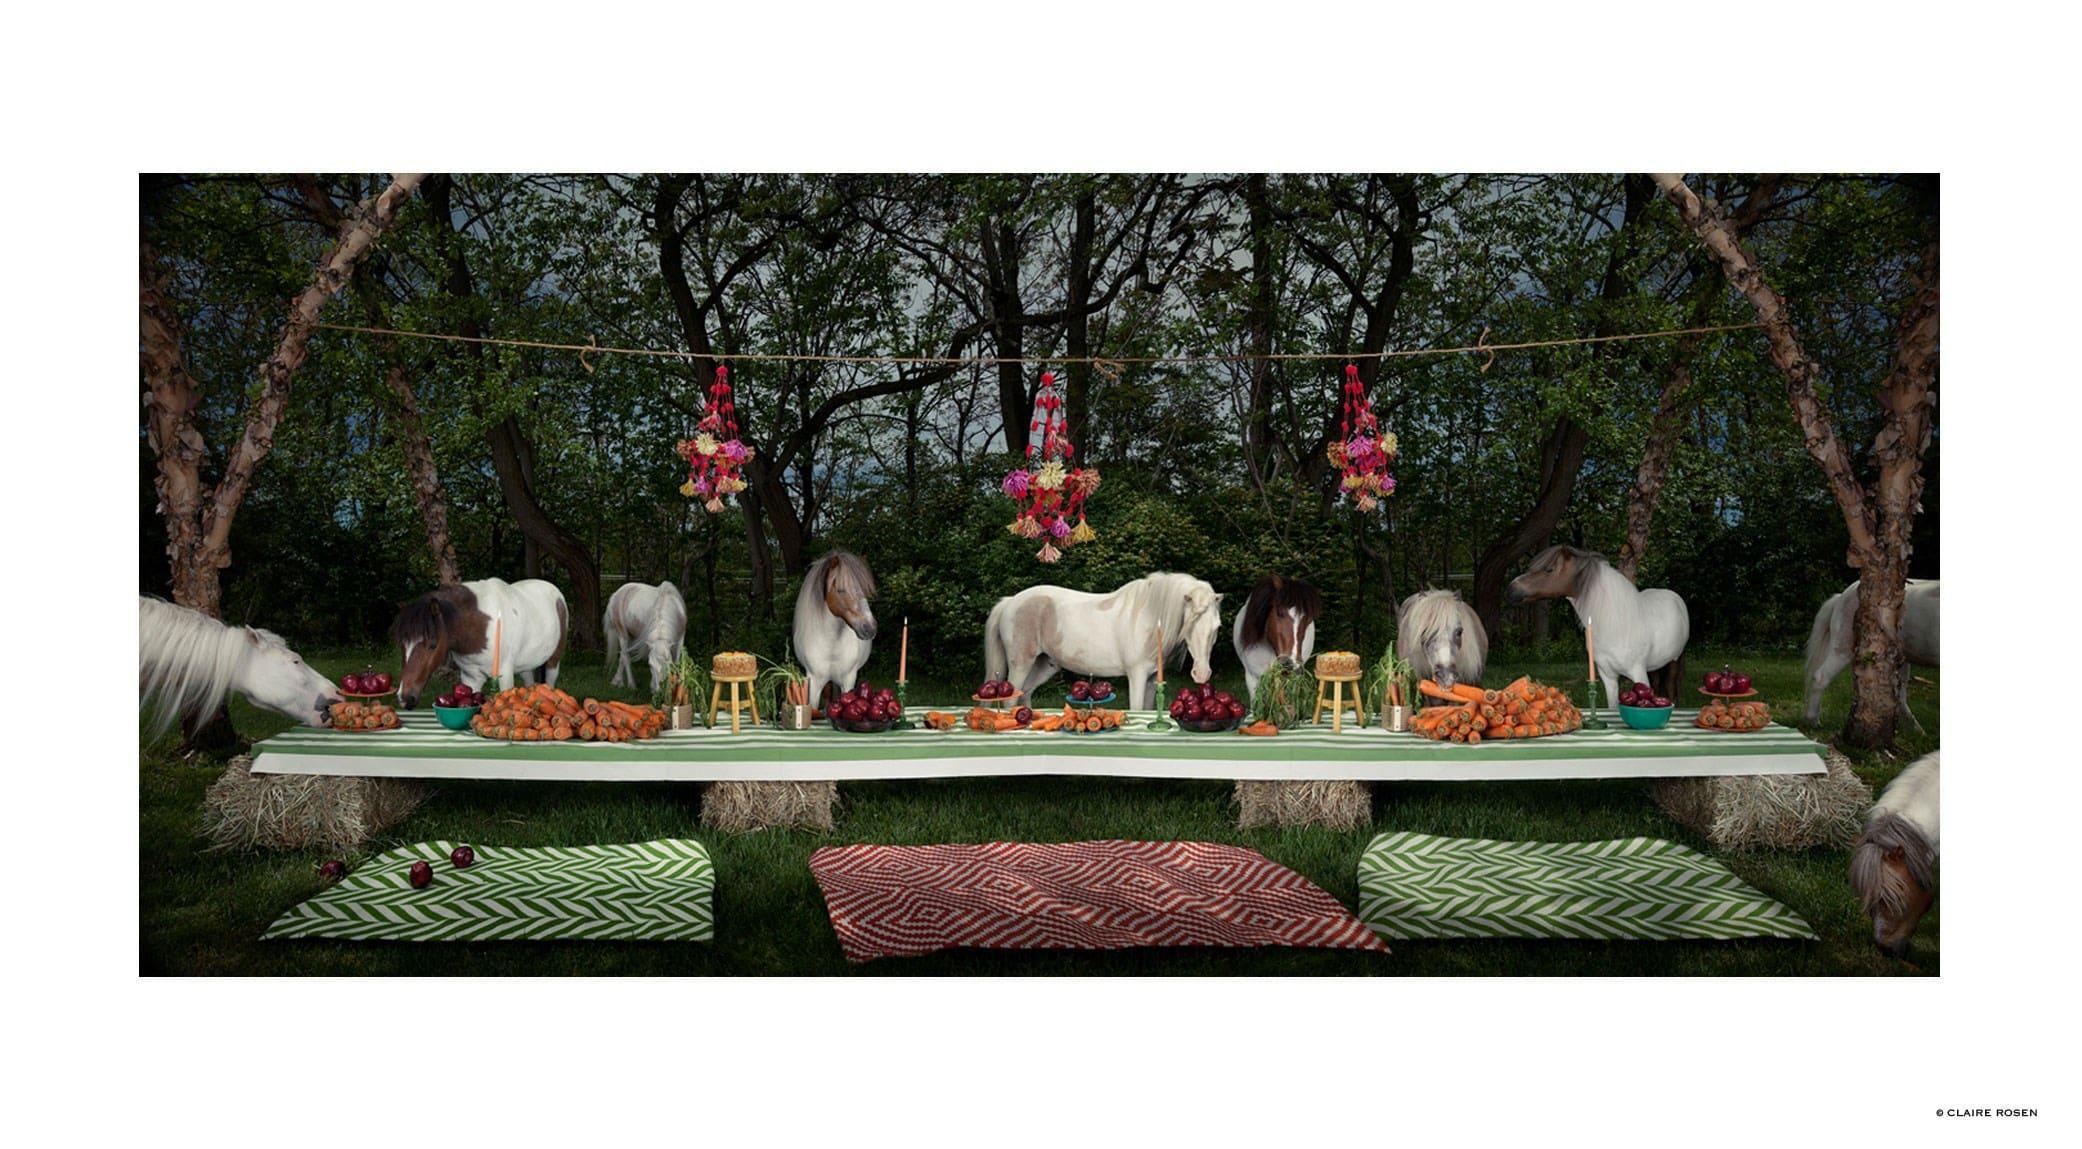 original_horses-claire-rosen-finedininglovers.jpg